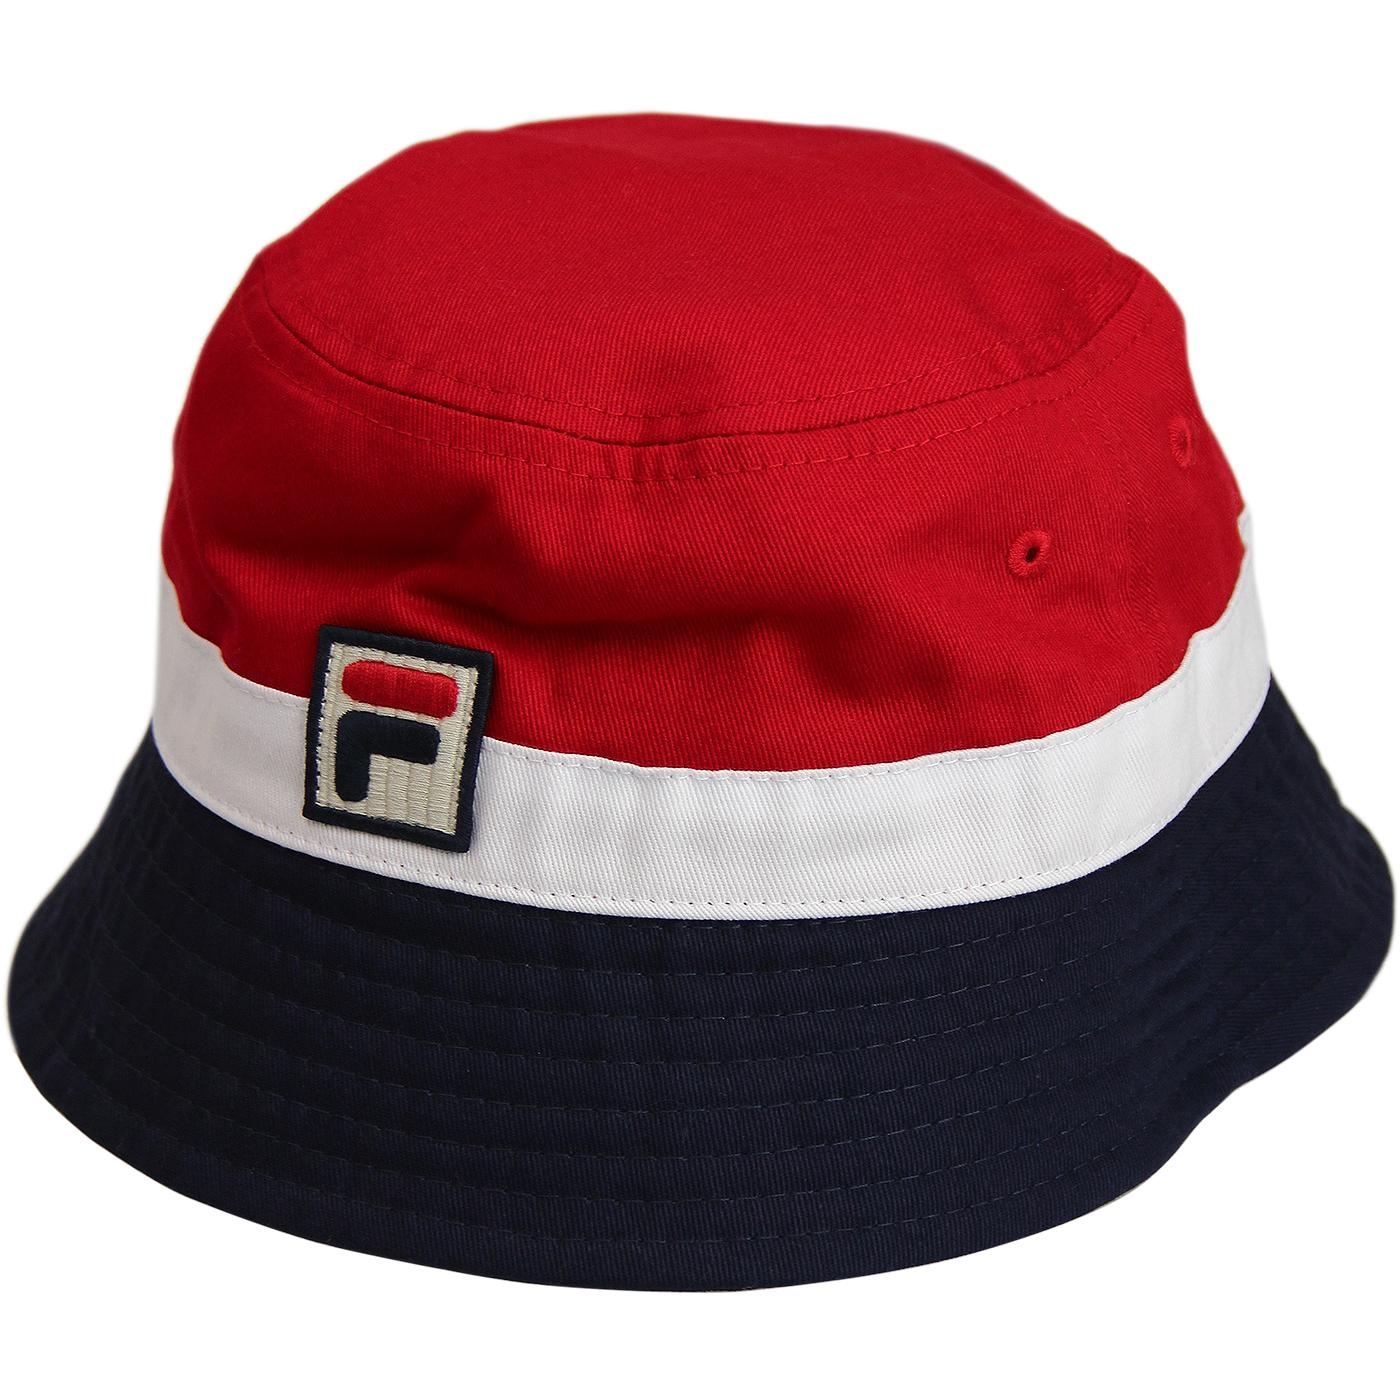 Basil FILA VINTAGE Retro 1990s Bucket Hat (CR/P/W)